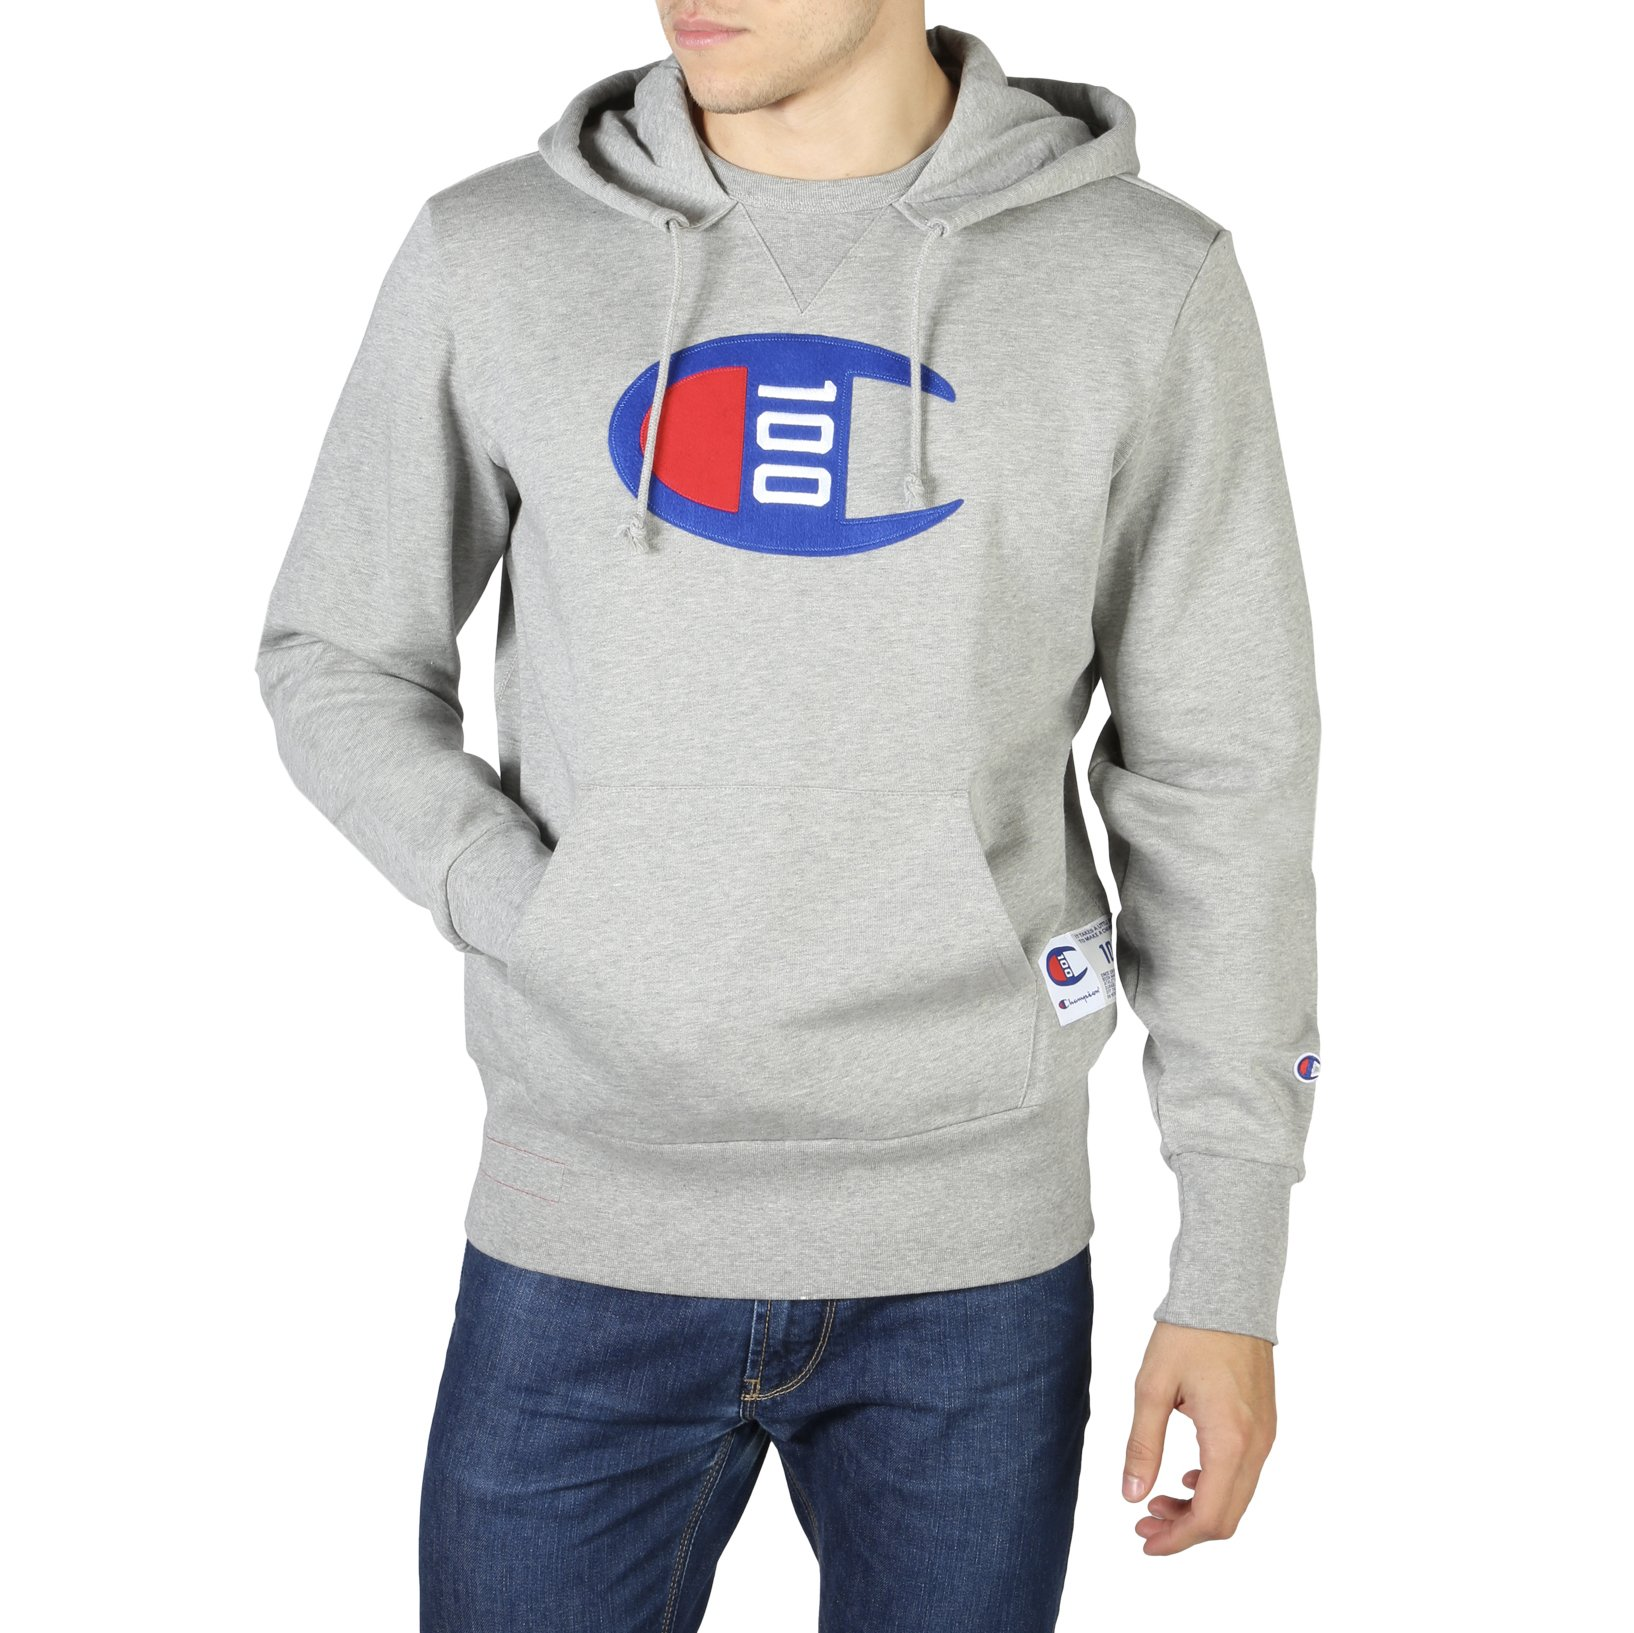 Champion Men's Sweatshirt Various Colours 214368 - grey S